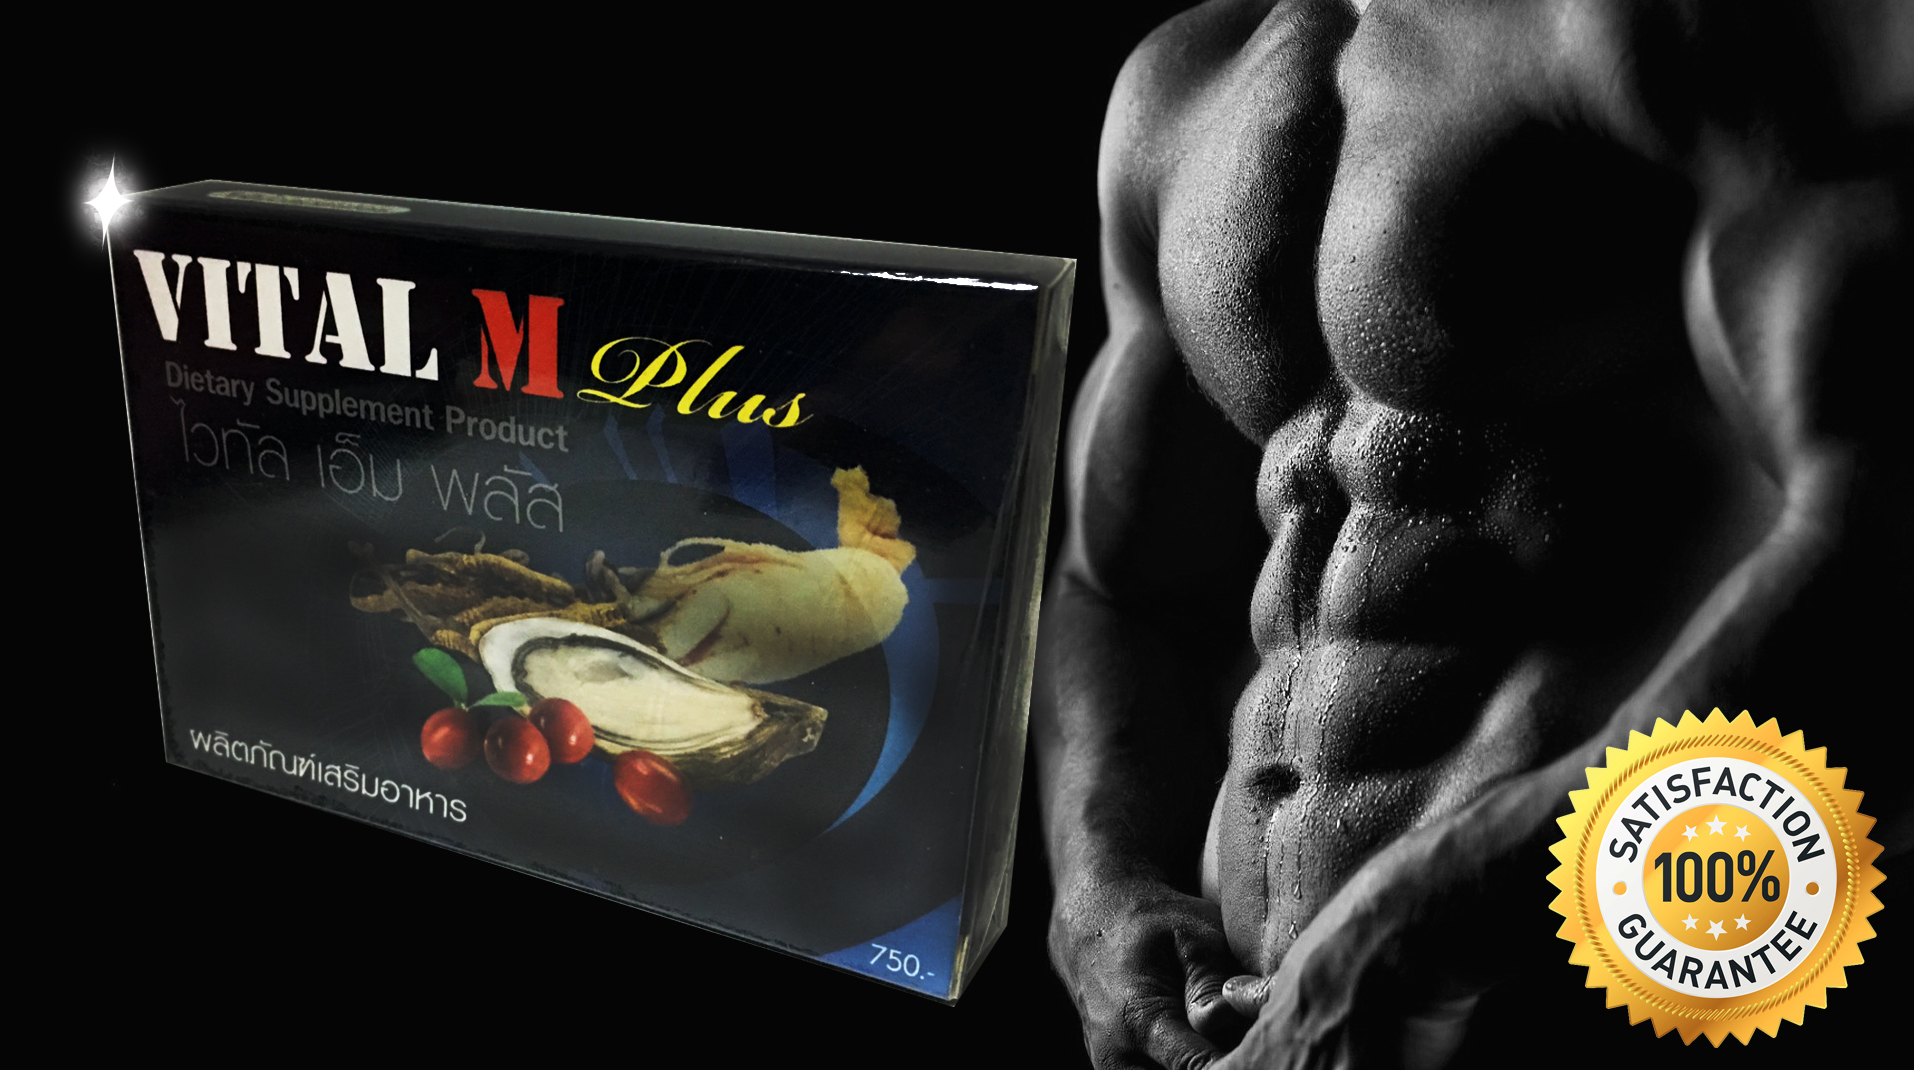 VITAL M Plus อาหารเสริมสมรรถภาพสำหรับท่านชาย